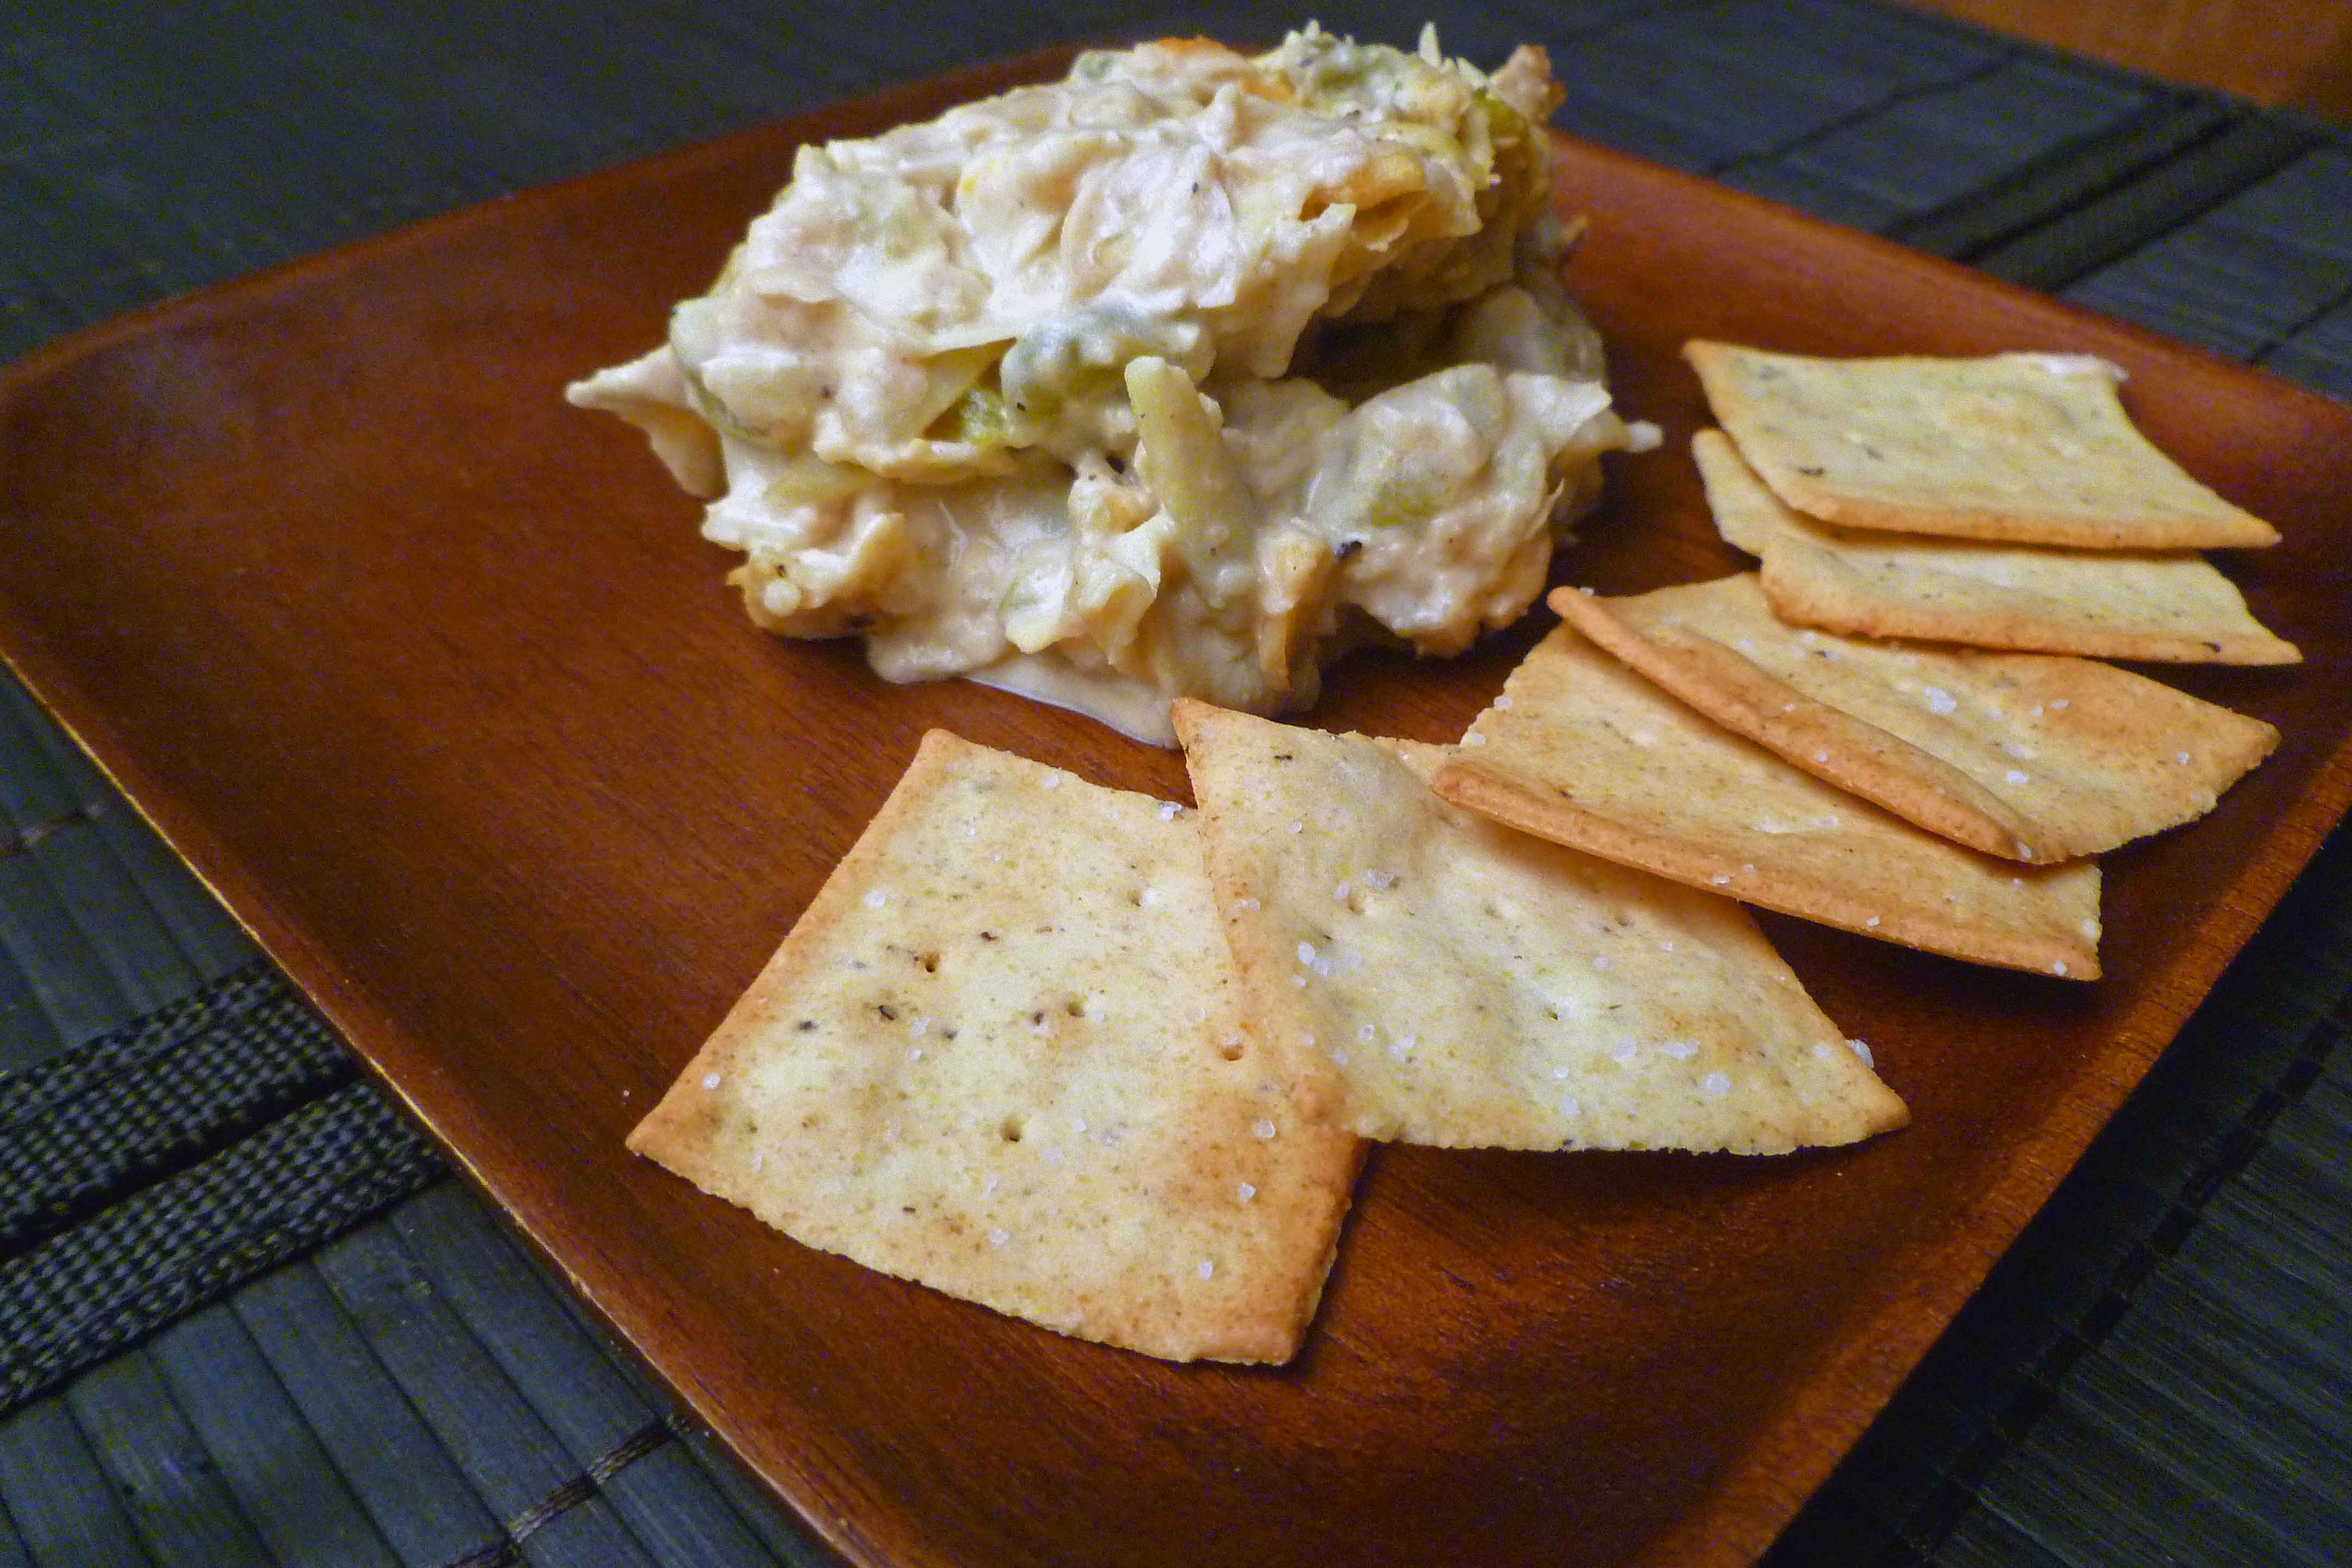 White Bean, Chile, and Artichoke Dip | Centex Cooks